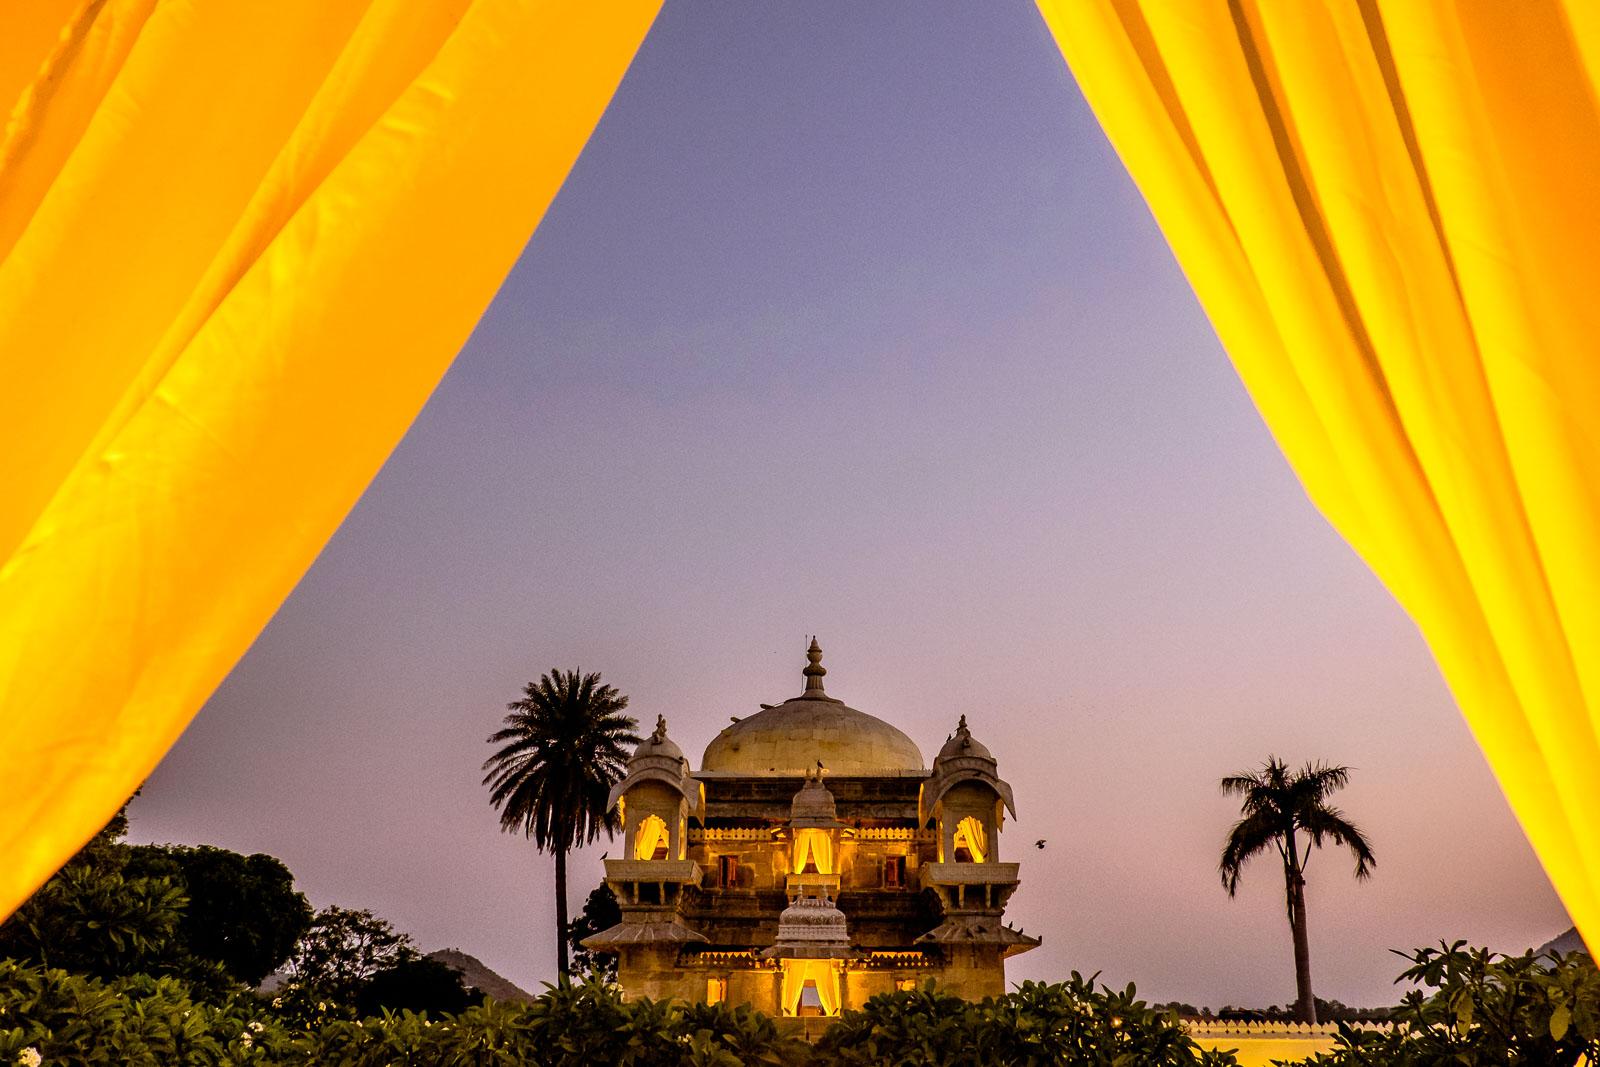 Enter Jagmandir, the palace on the lake